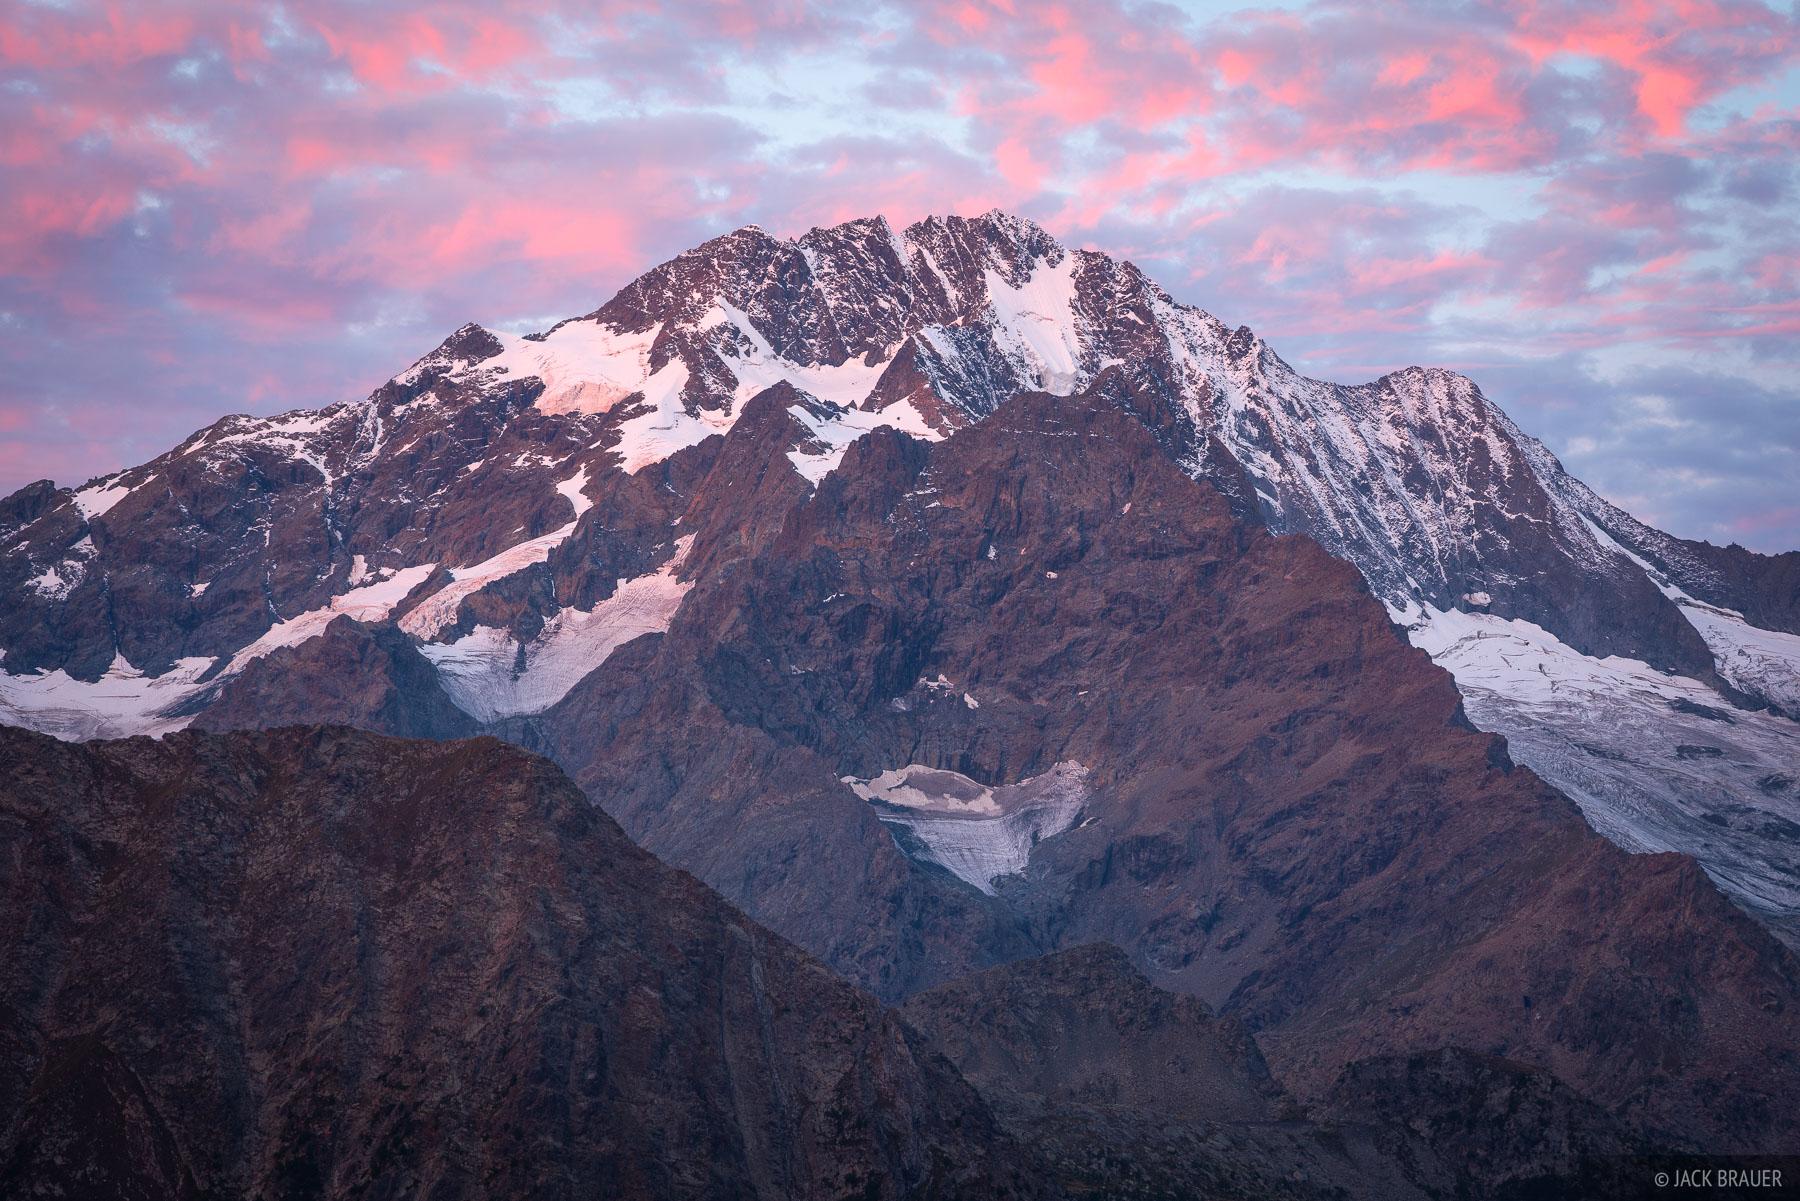 Bernina Range, Italy, Monte Disgrazia, Rhaetian Alps, A7R3, Alps, photo